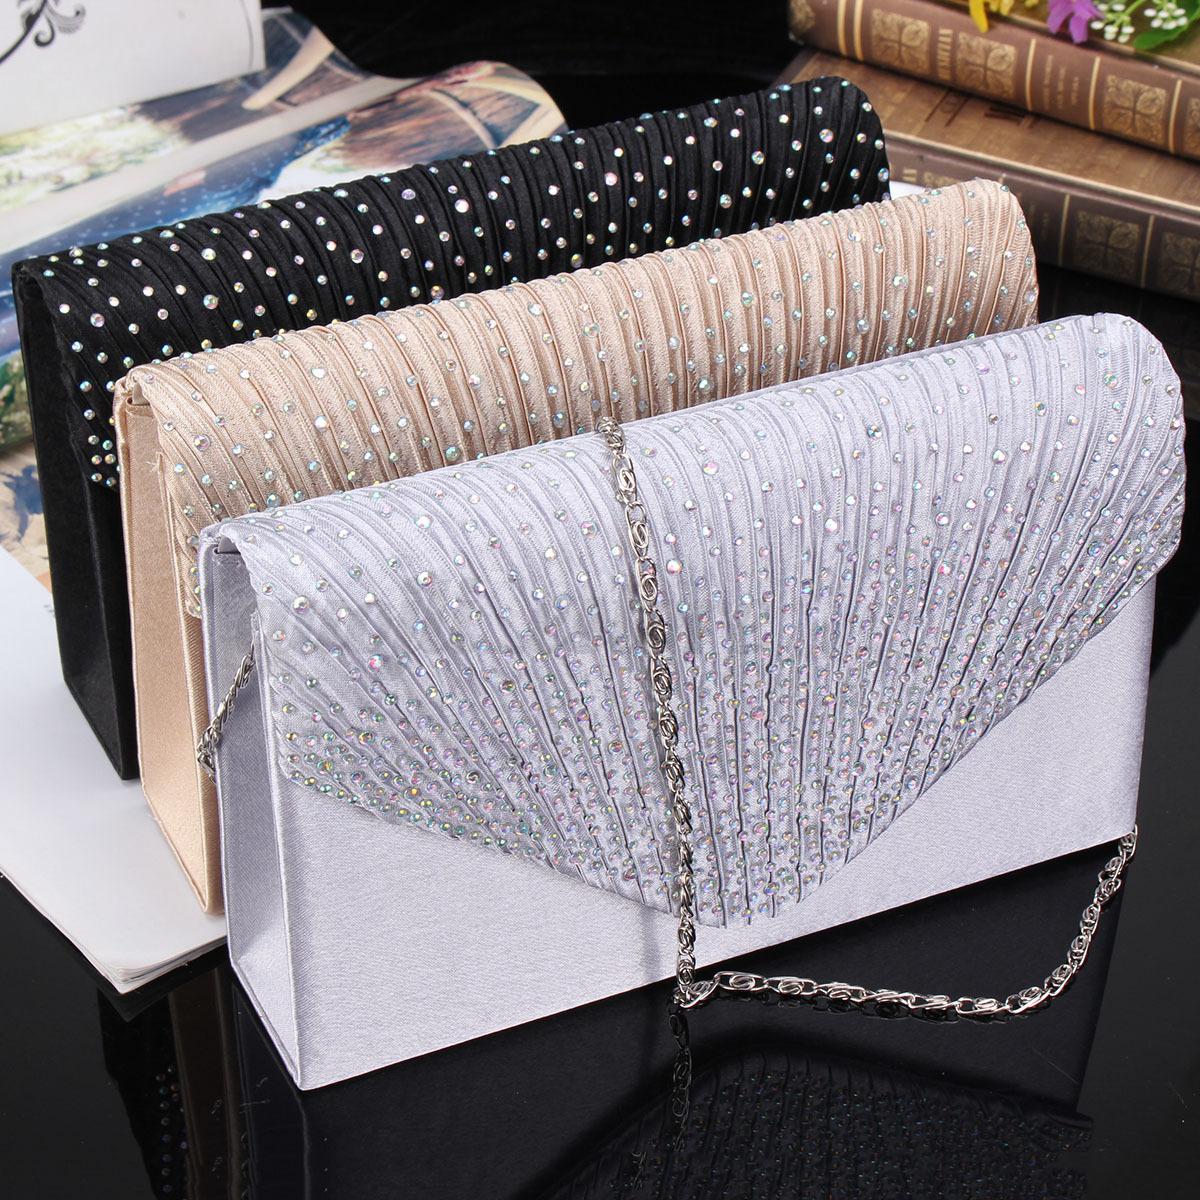 US-Women-Evening-Bag-Satin-Bridal-Clutch-Party-Envelope-Bag-Handbag-Small-Purse